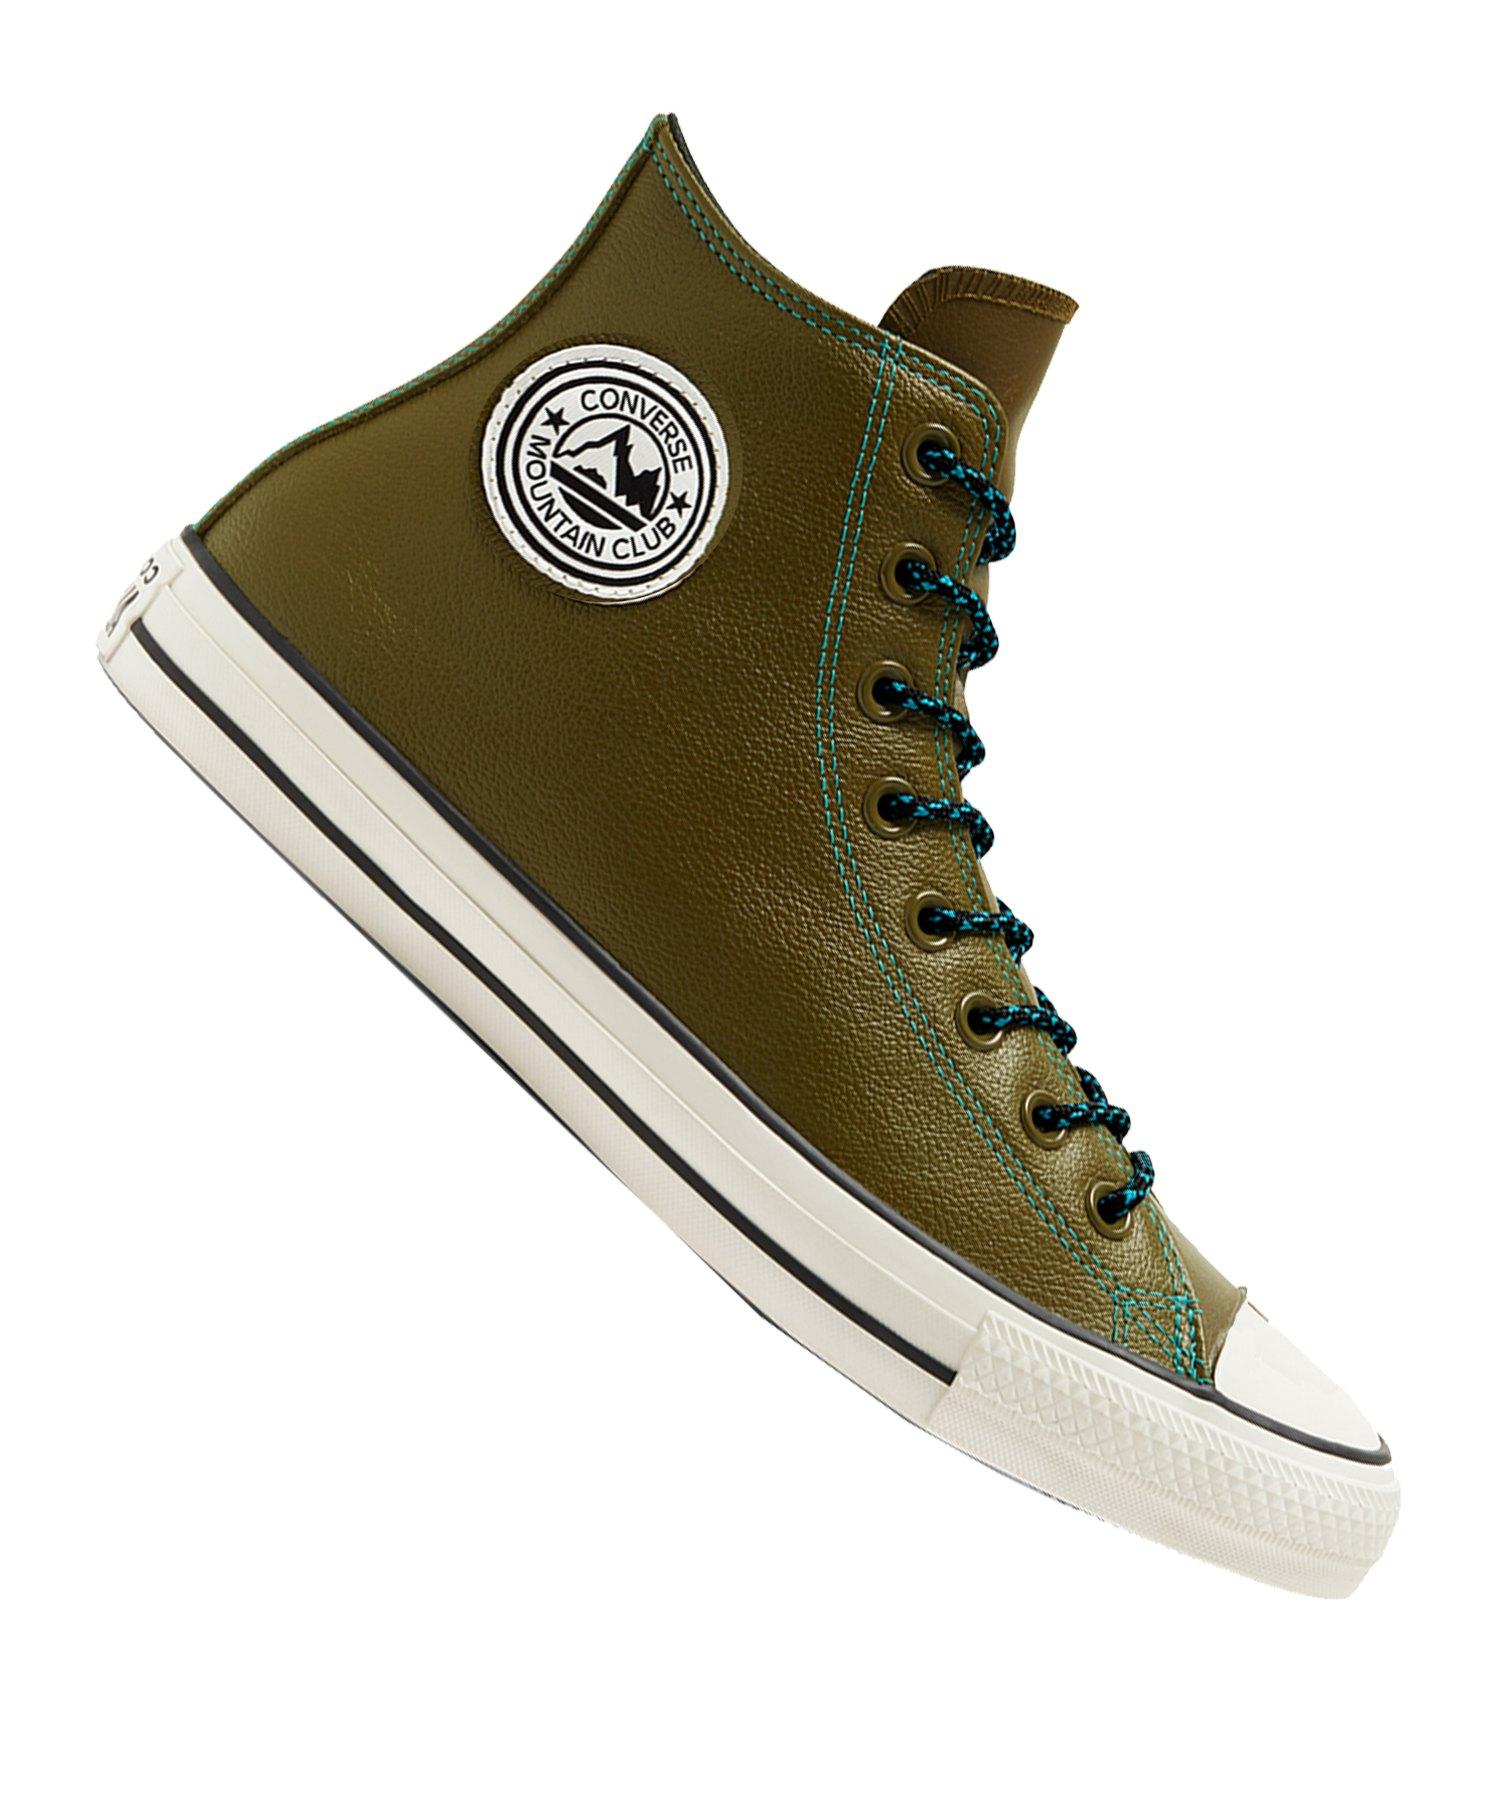 Converse Chuck Taylor AS High Sneaker Grün - grün